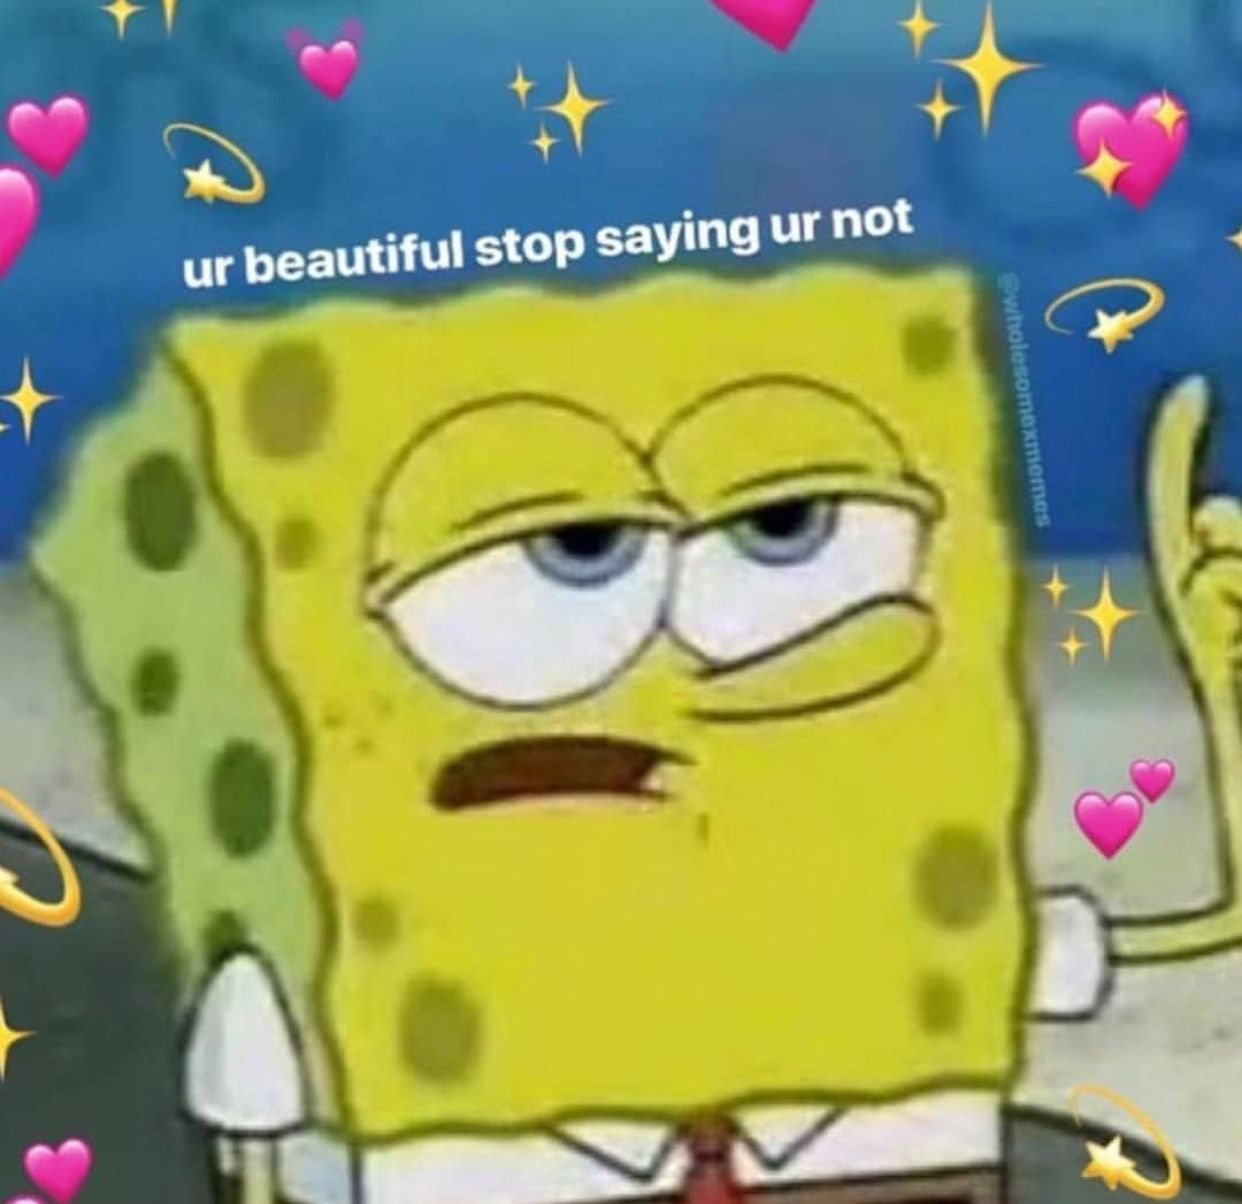 Pin By Es Py On Appreciation Memes Cute Love Memes Cute Memes Bad Memes